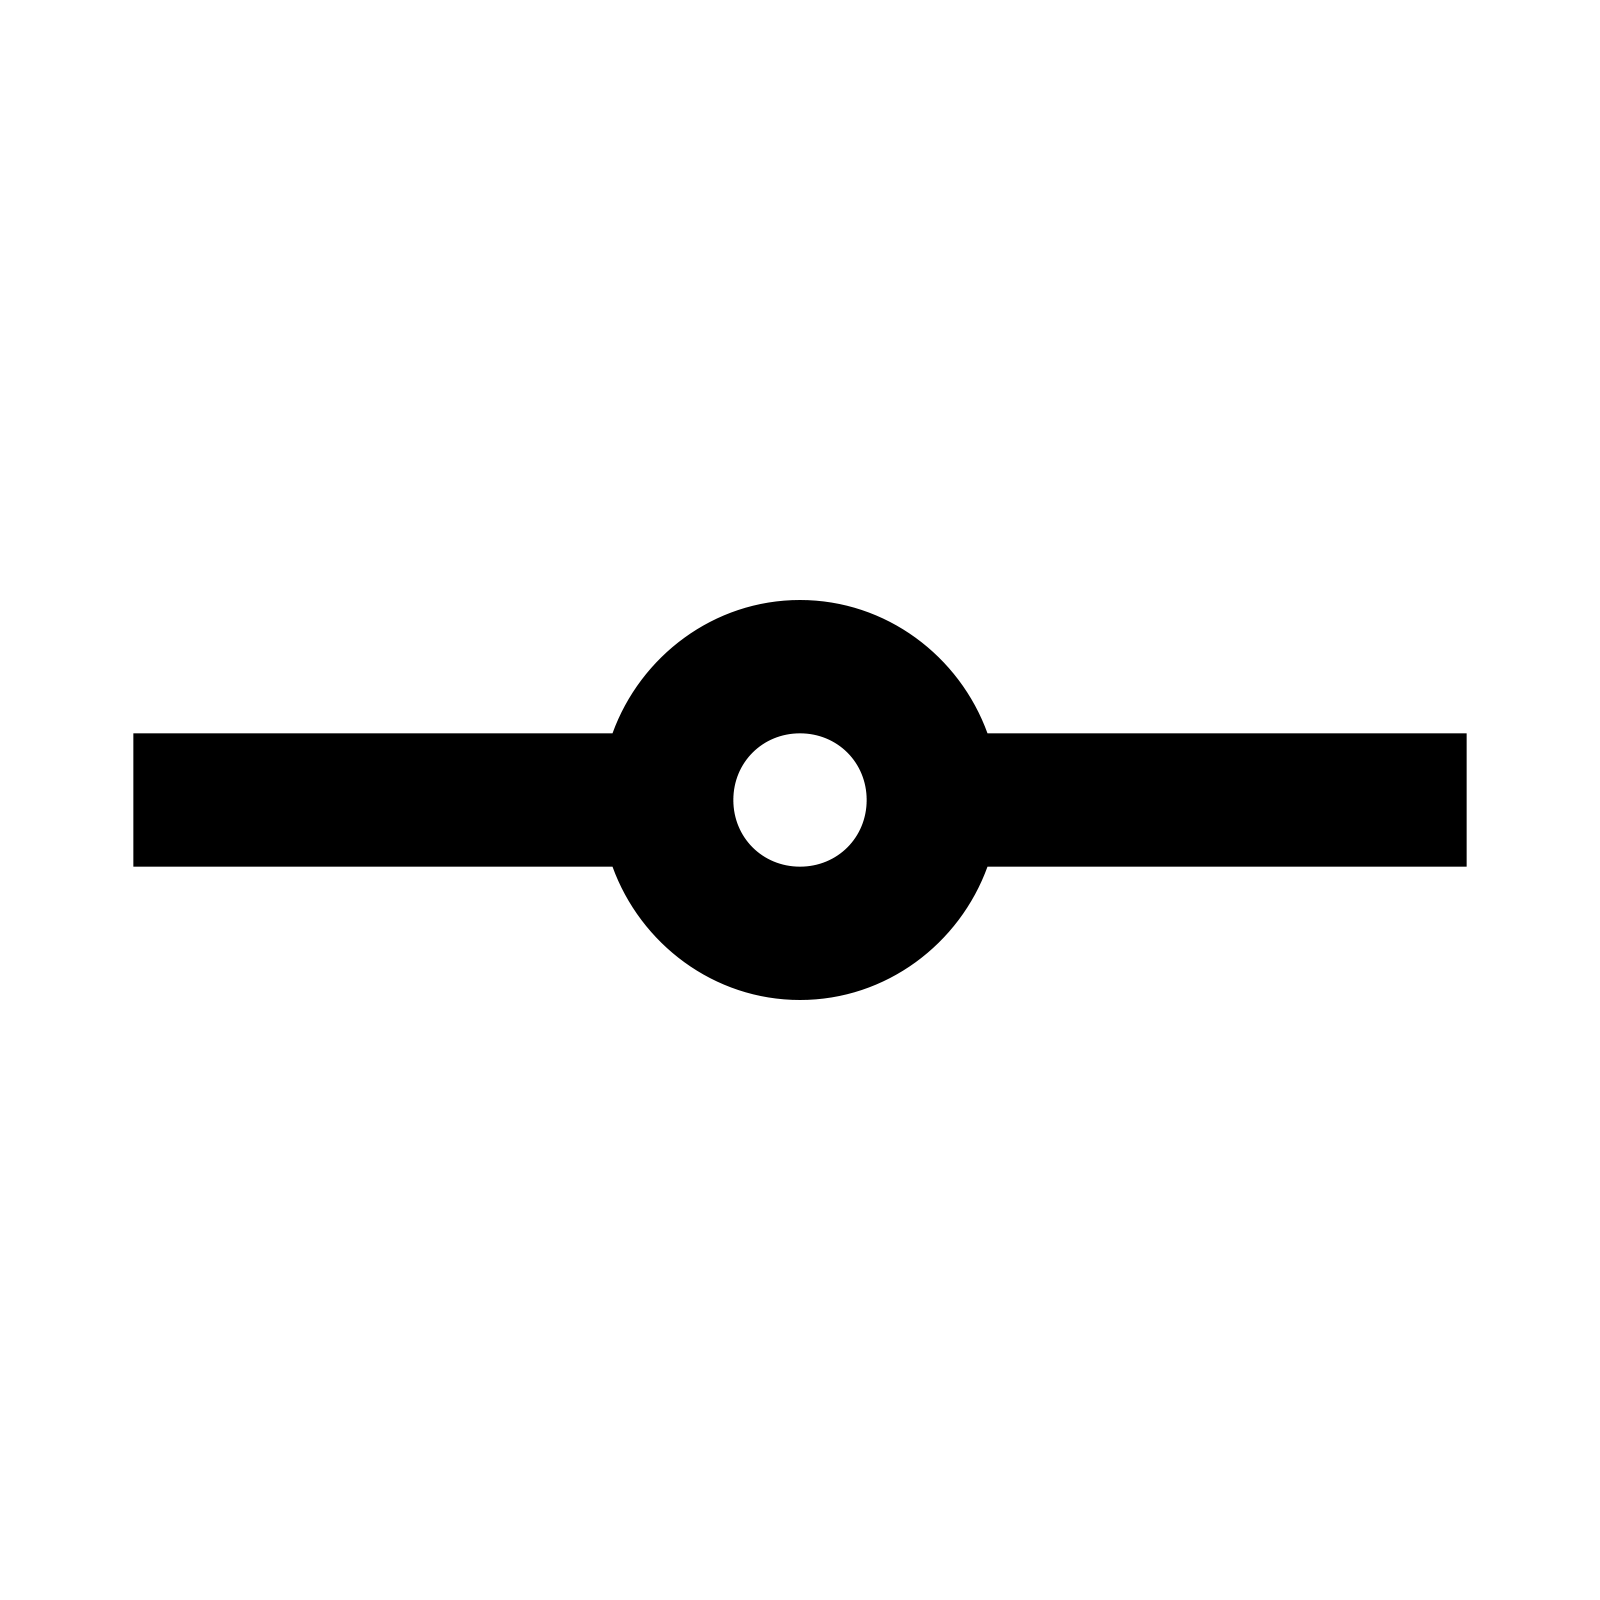 1600x1600 Commit Git Icon